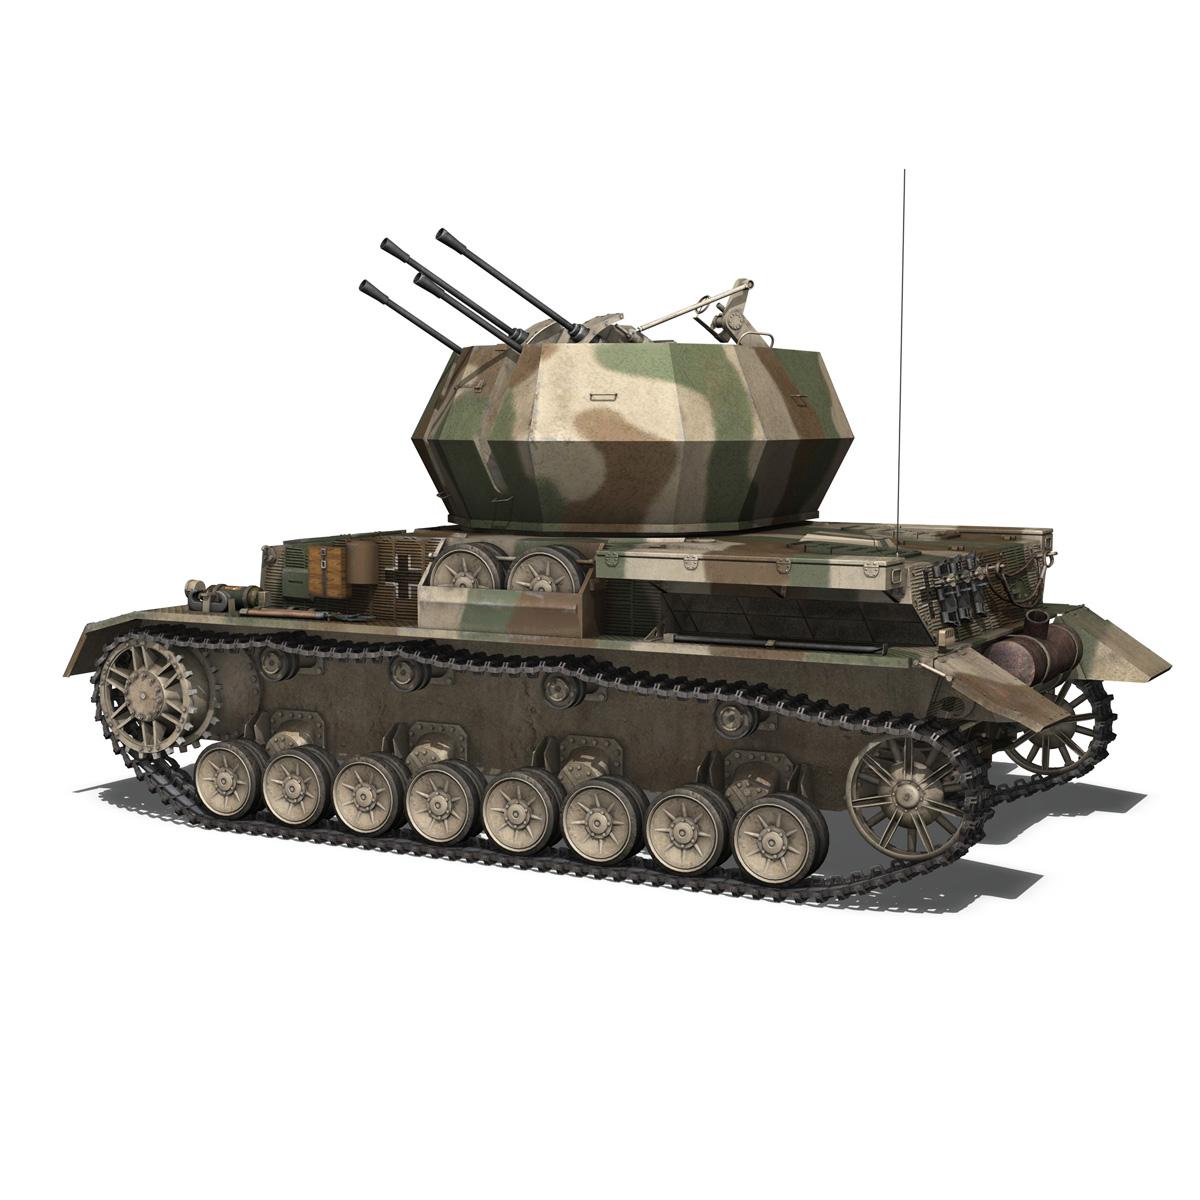 flakpanzer iv – wirbelwind – spzjgabt 654 3d model 3ds fbx c4d lwo obj 282306